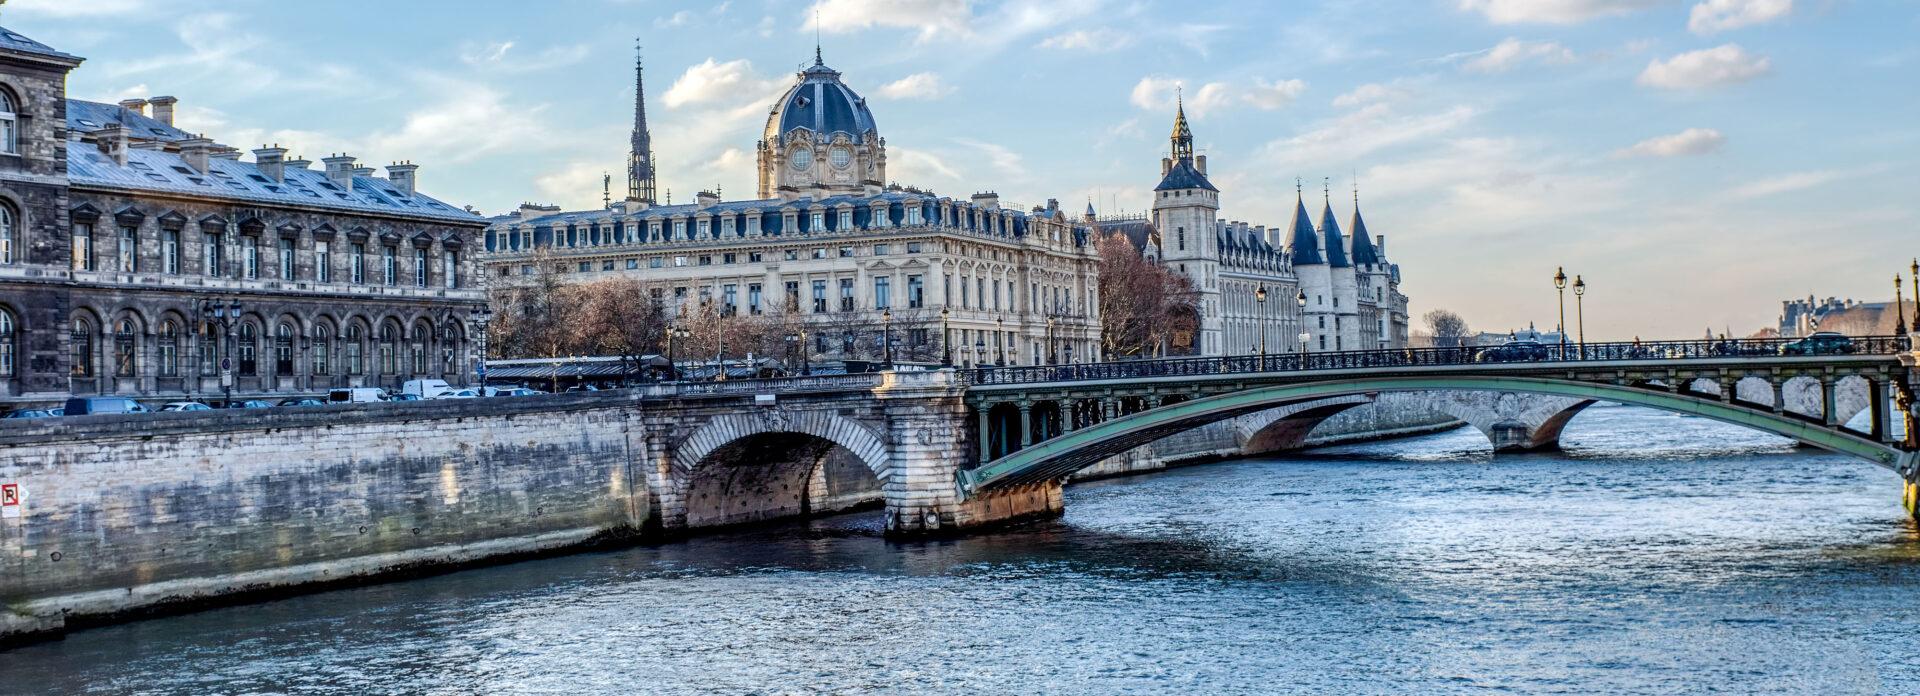 Ile de la cite Paris elv oy oygruppe